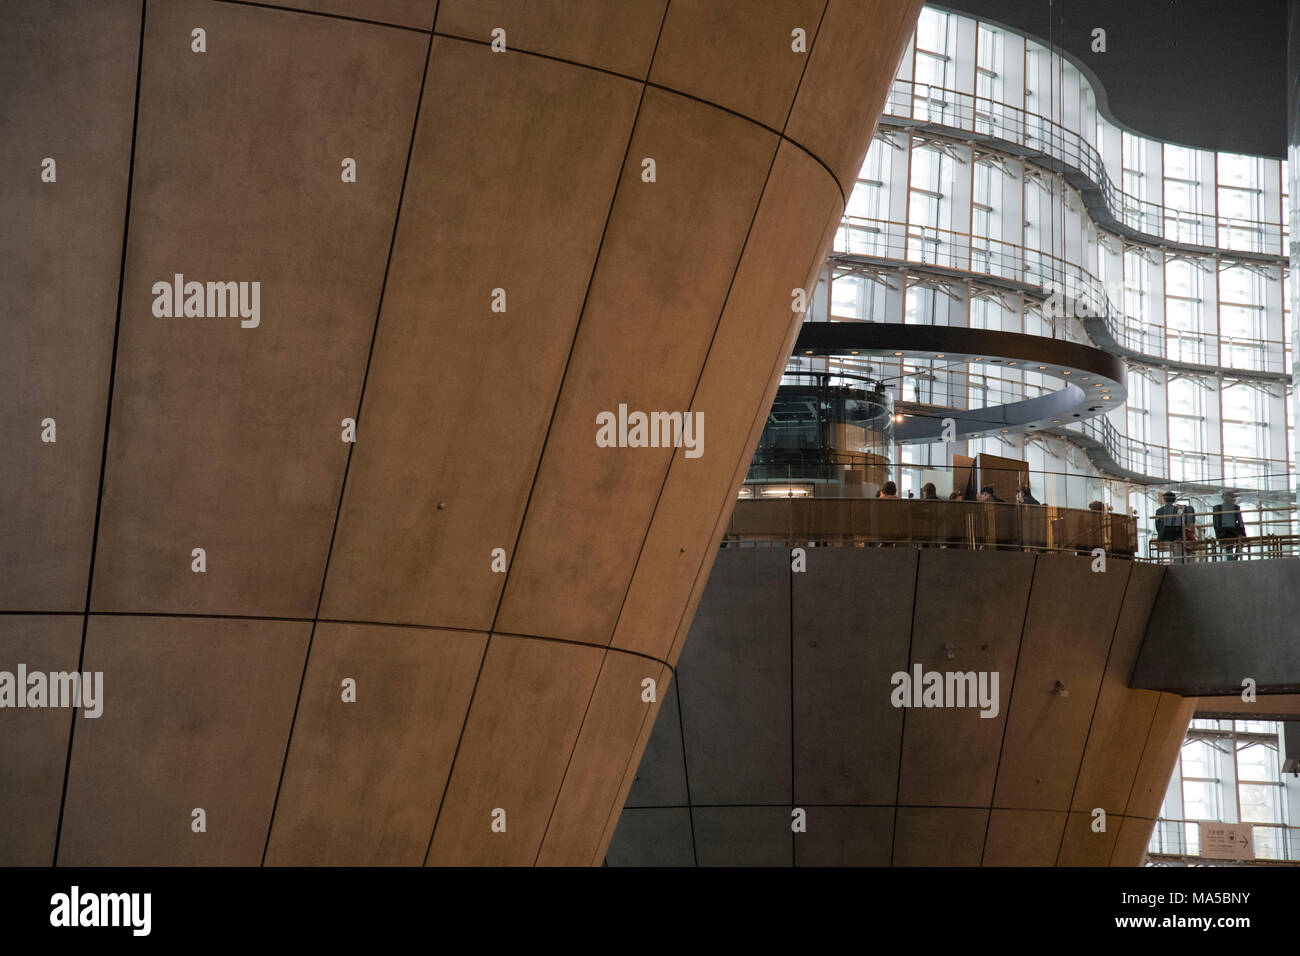 Asia, Japan, Nihon, Nippon, Tokyo, Minato, traditional Art centre Tokyo Stock Photo